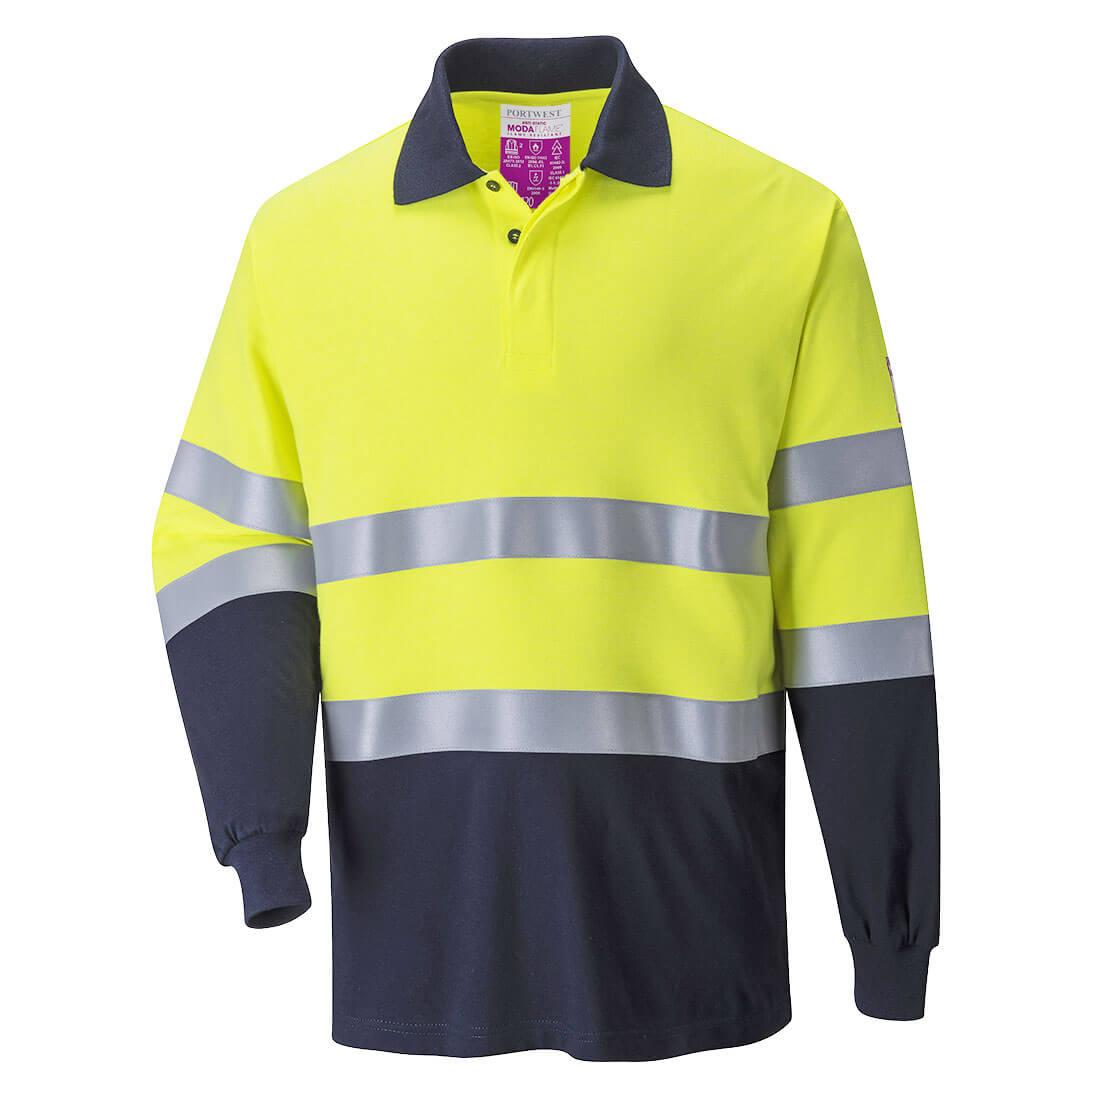 Image of Modaflame Mens Flame Resistant Hi Vis 2-Tone Polo Shirt Yellow / Navy 2XL